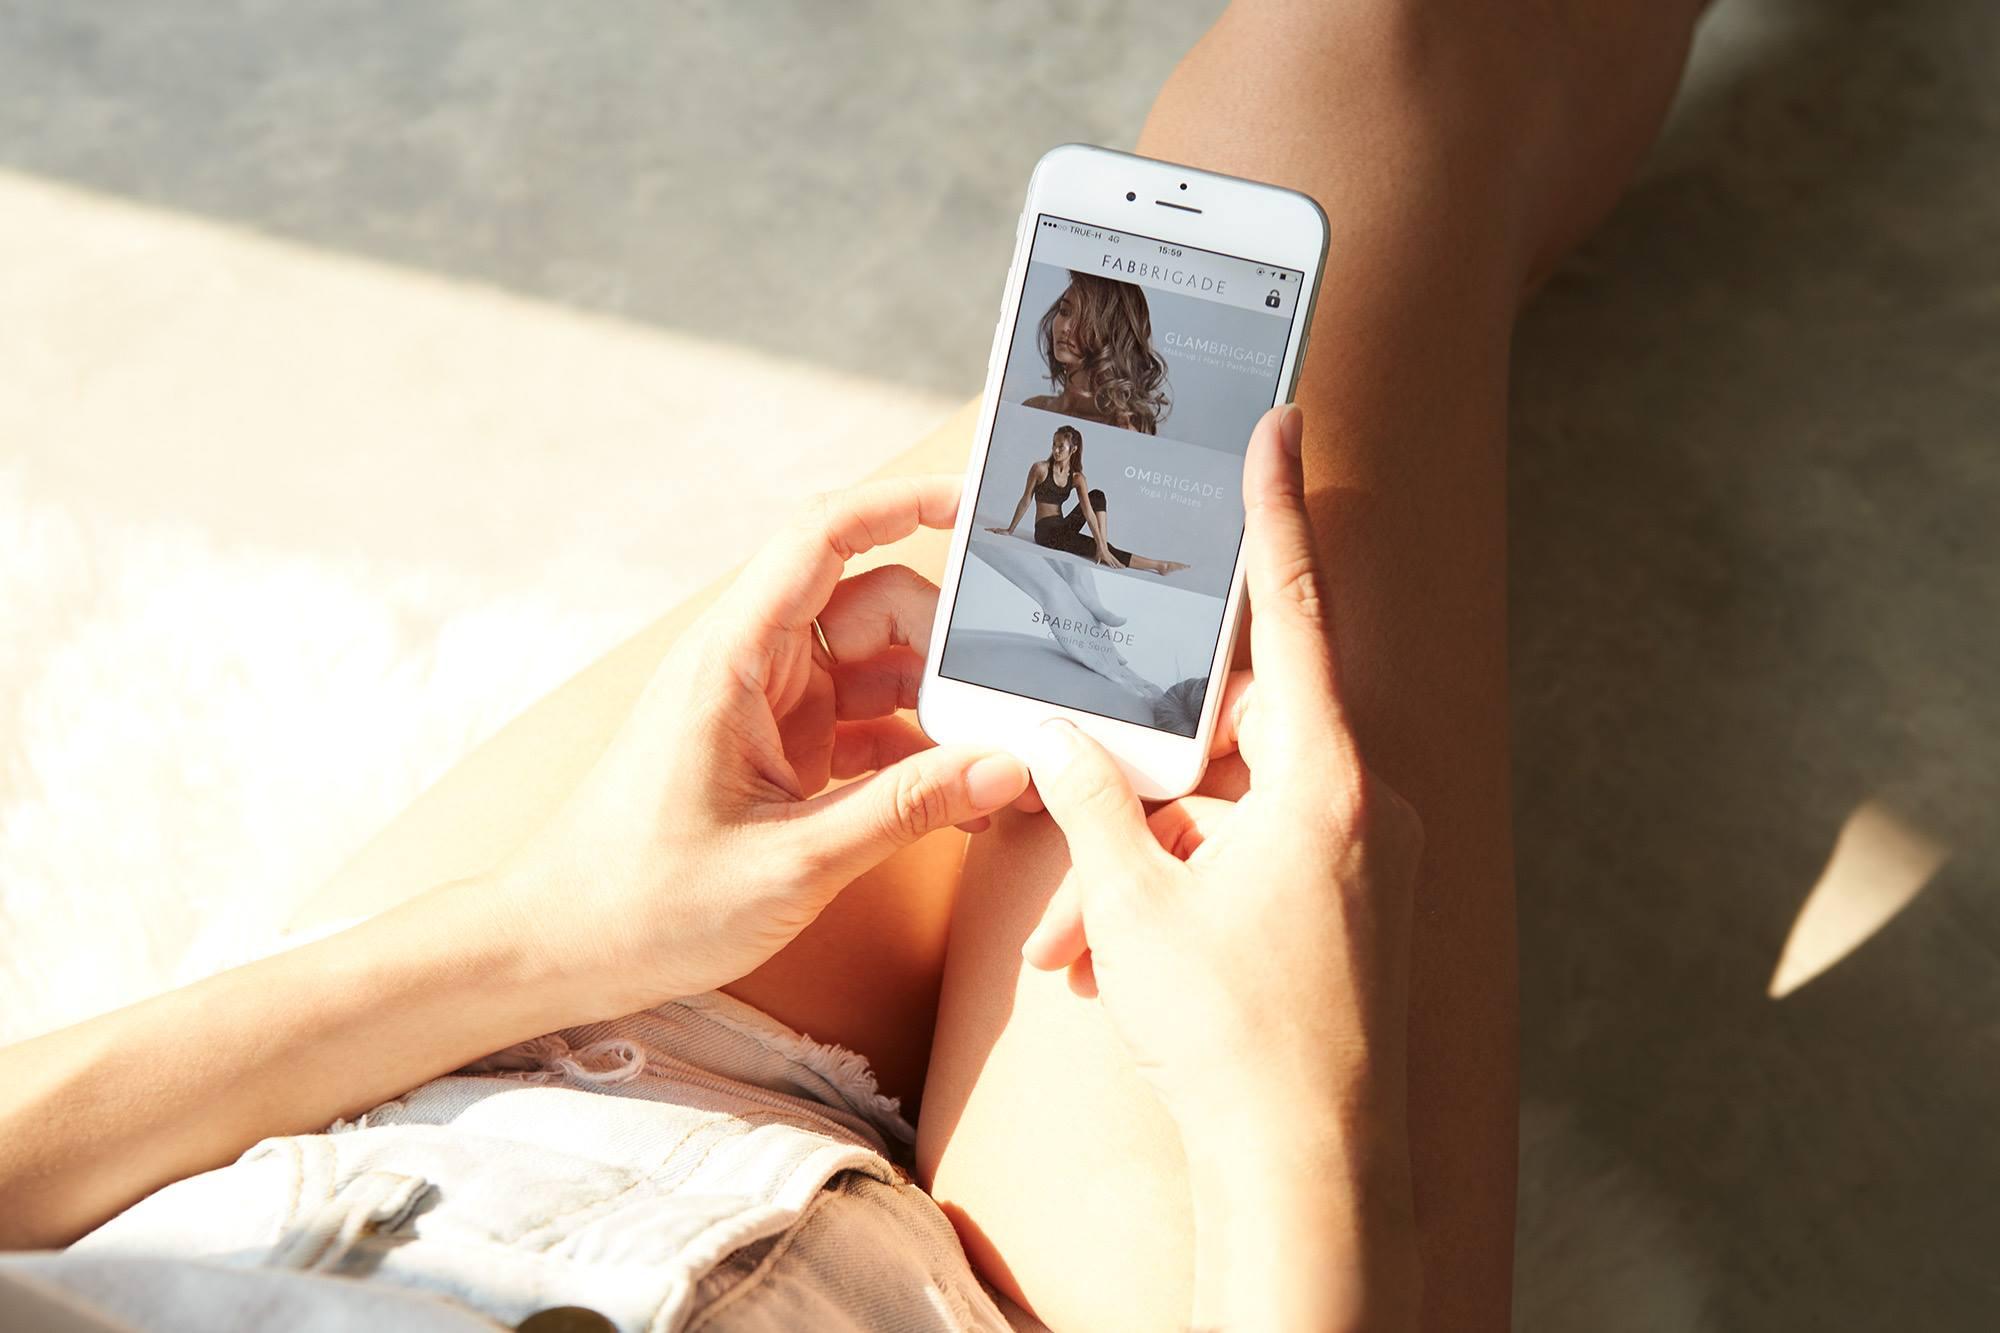 14 Startup ไทย พลิกไอเดียใหม่ให้ชีวิตง่ายกว่าเดิม #ลองใช้ยัง? 2 - Advertorial